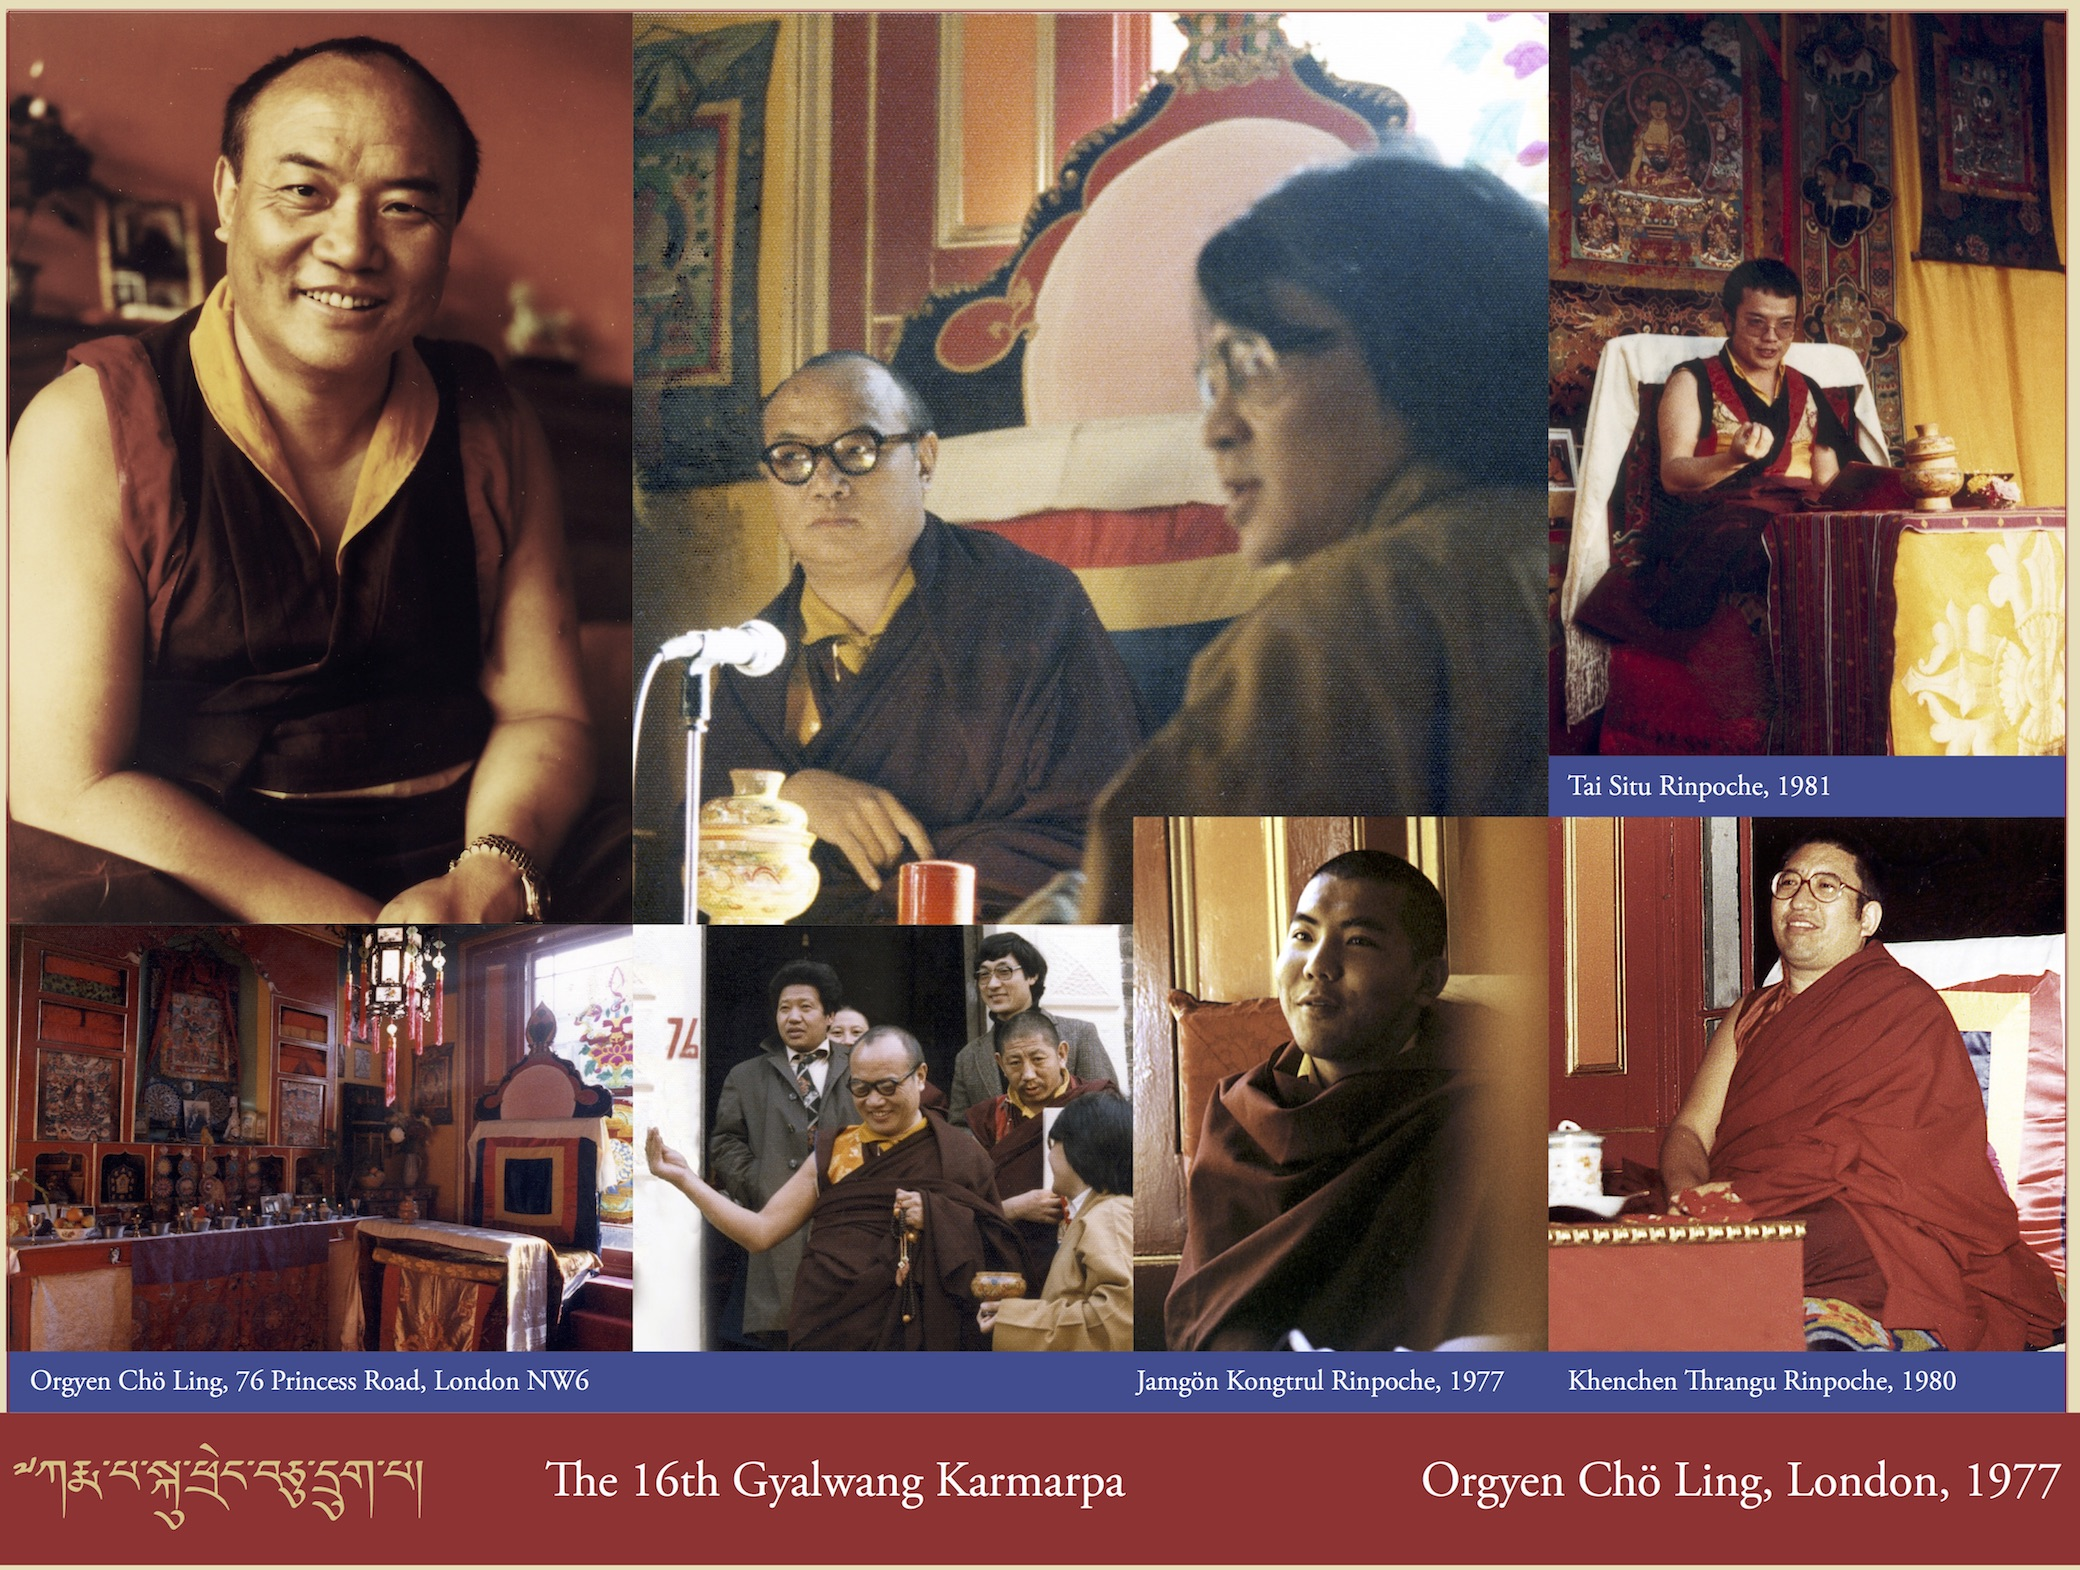 The 16th Gyalwang Karmarpa at Orgyen Chö Ling, London, 1977